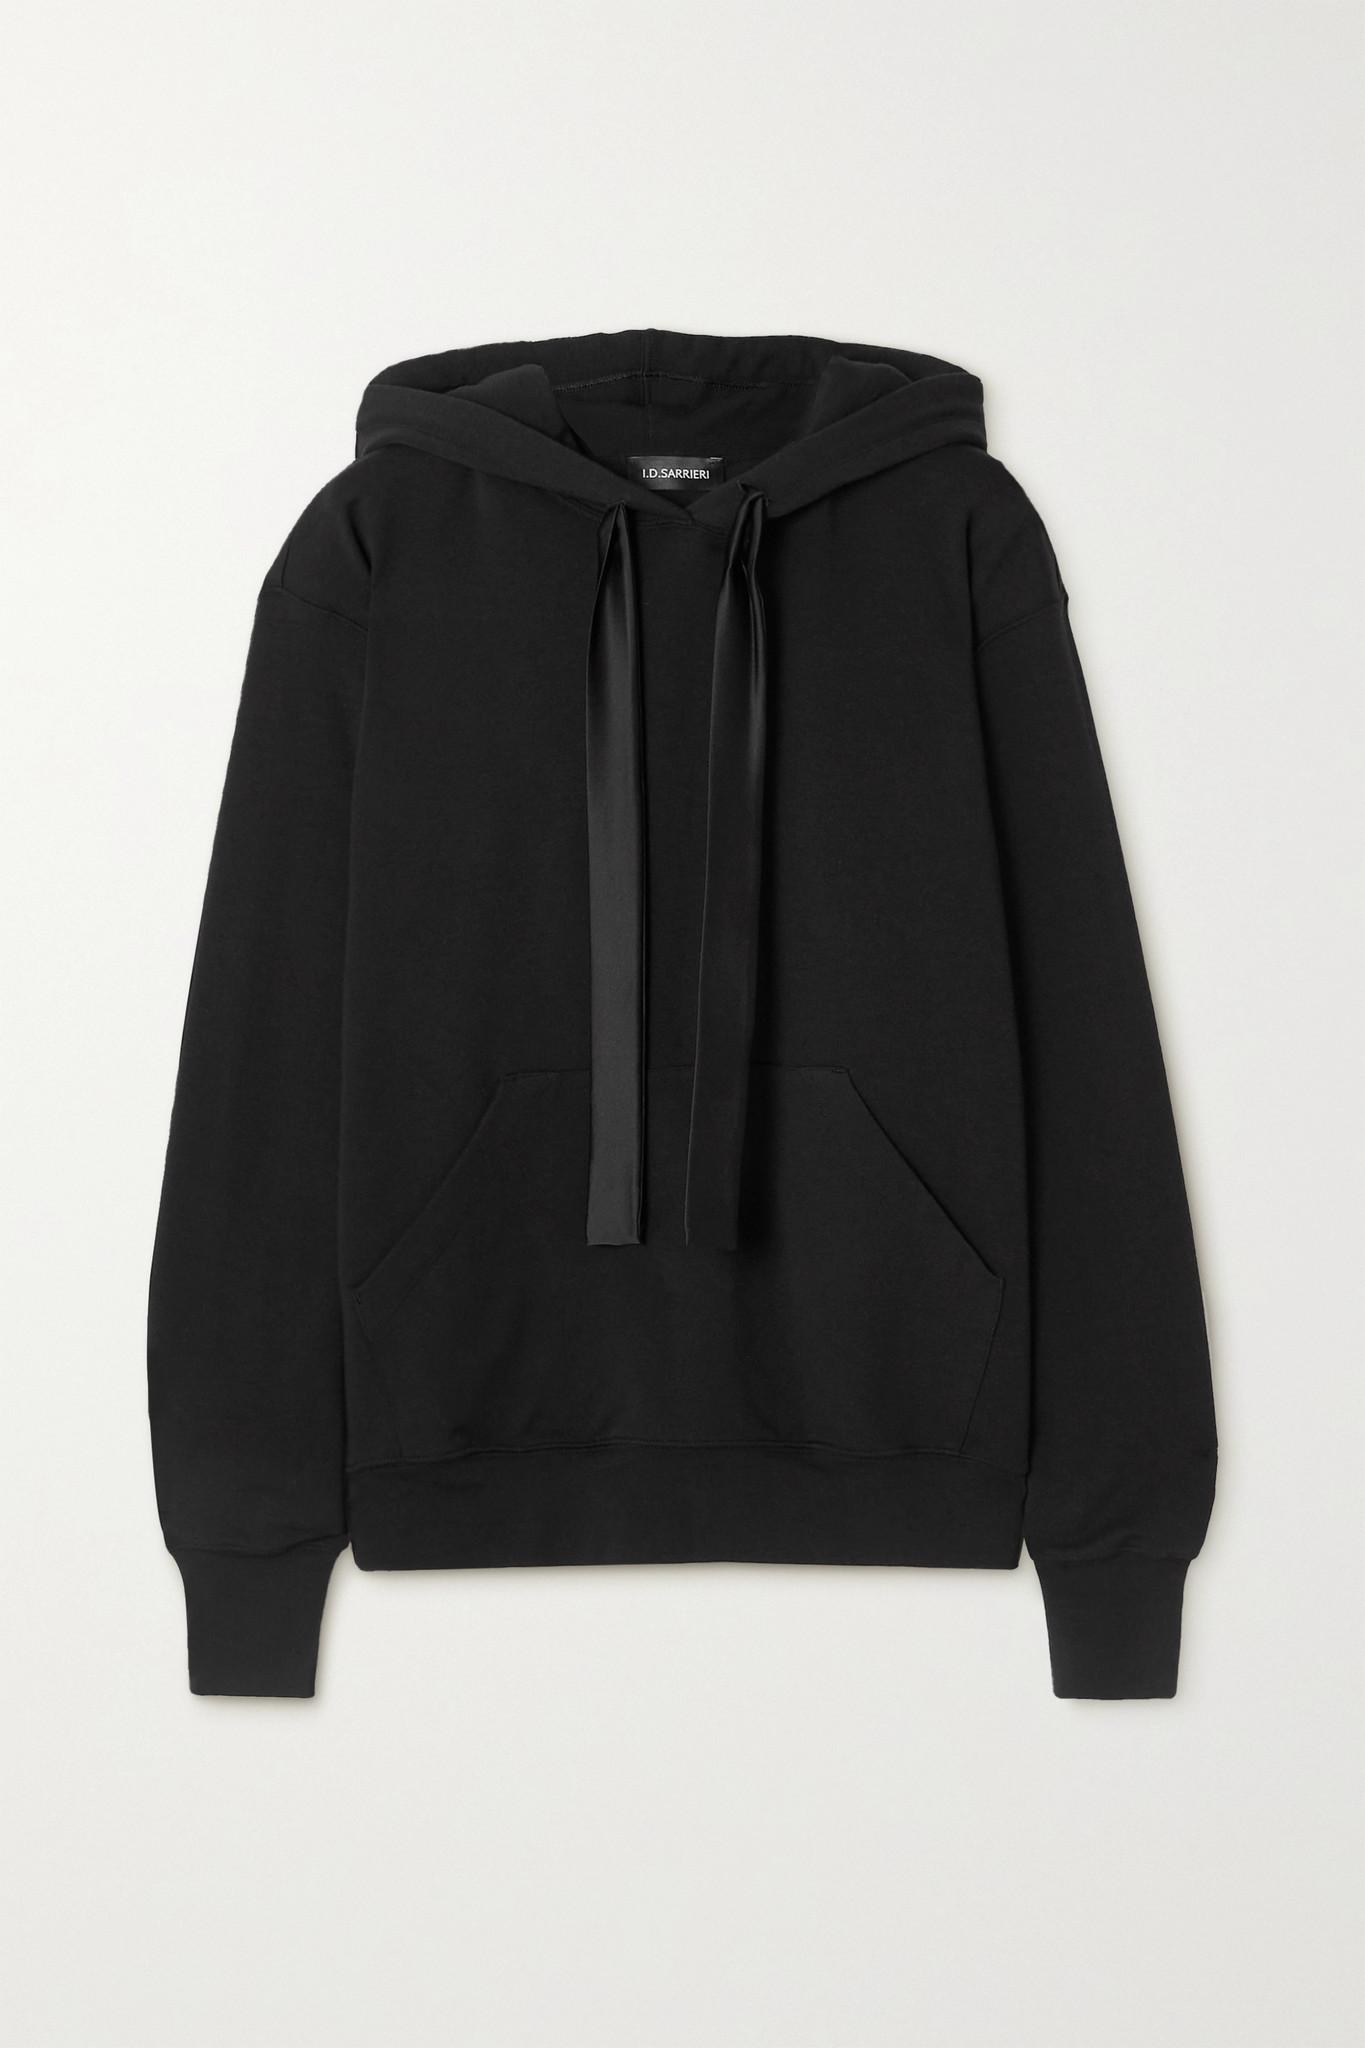 I.D. SARRIERI - 缎布边饰棉质混纺平纹布帽衫 - 黑色 - small